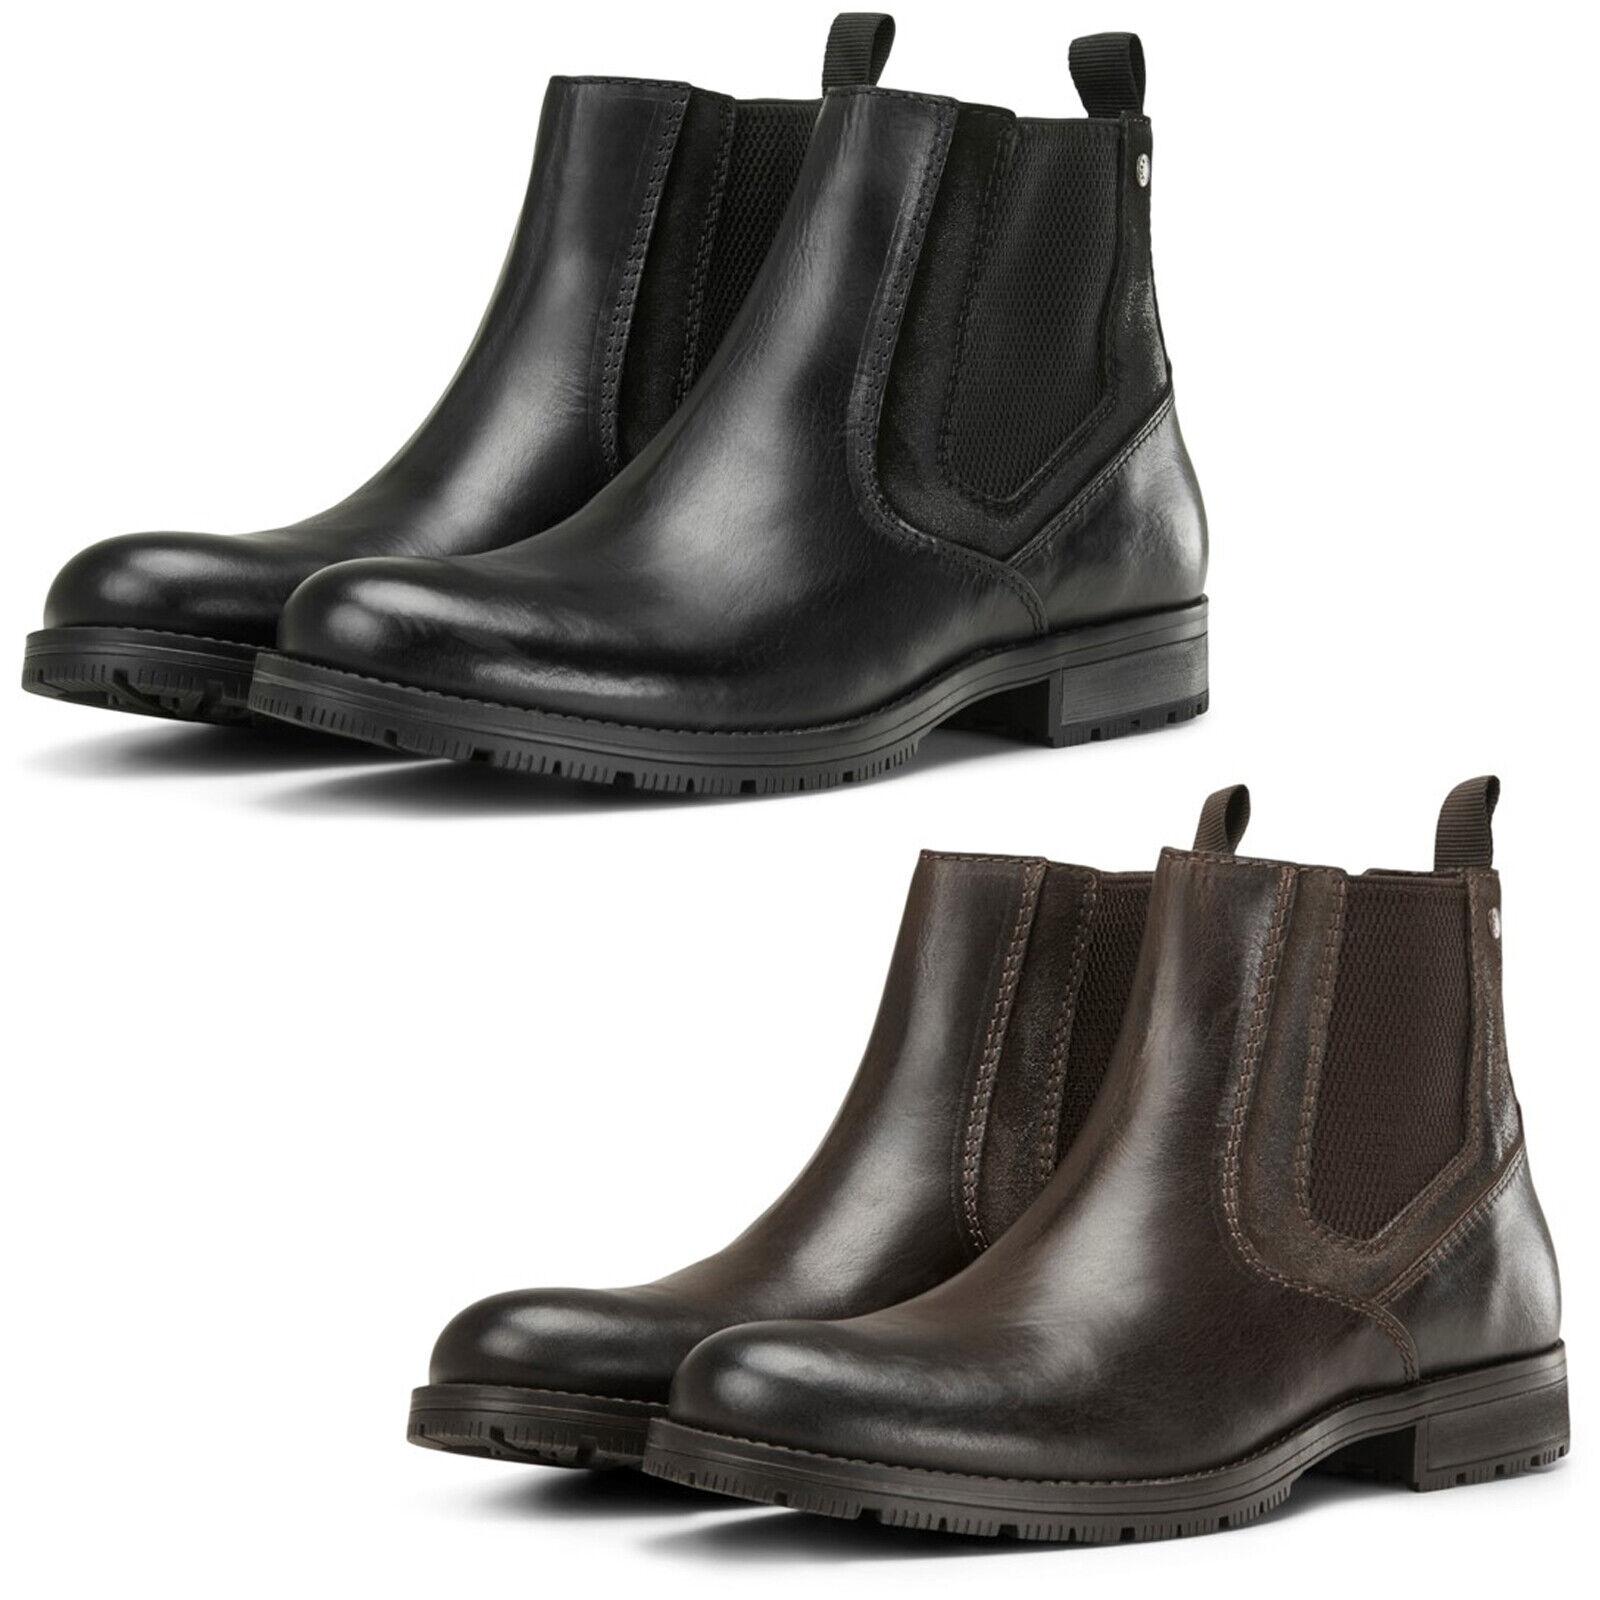 Jack \u0026 Jones Chelsea Boots Mens Leather